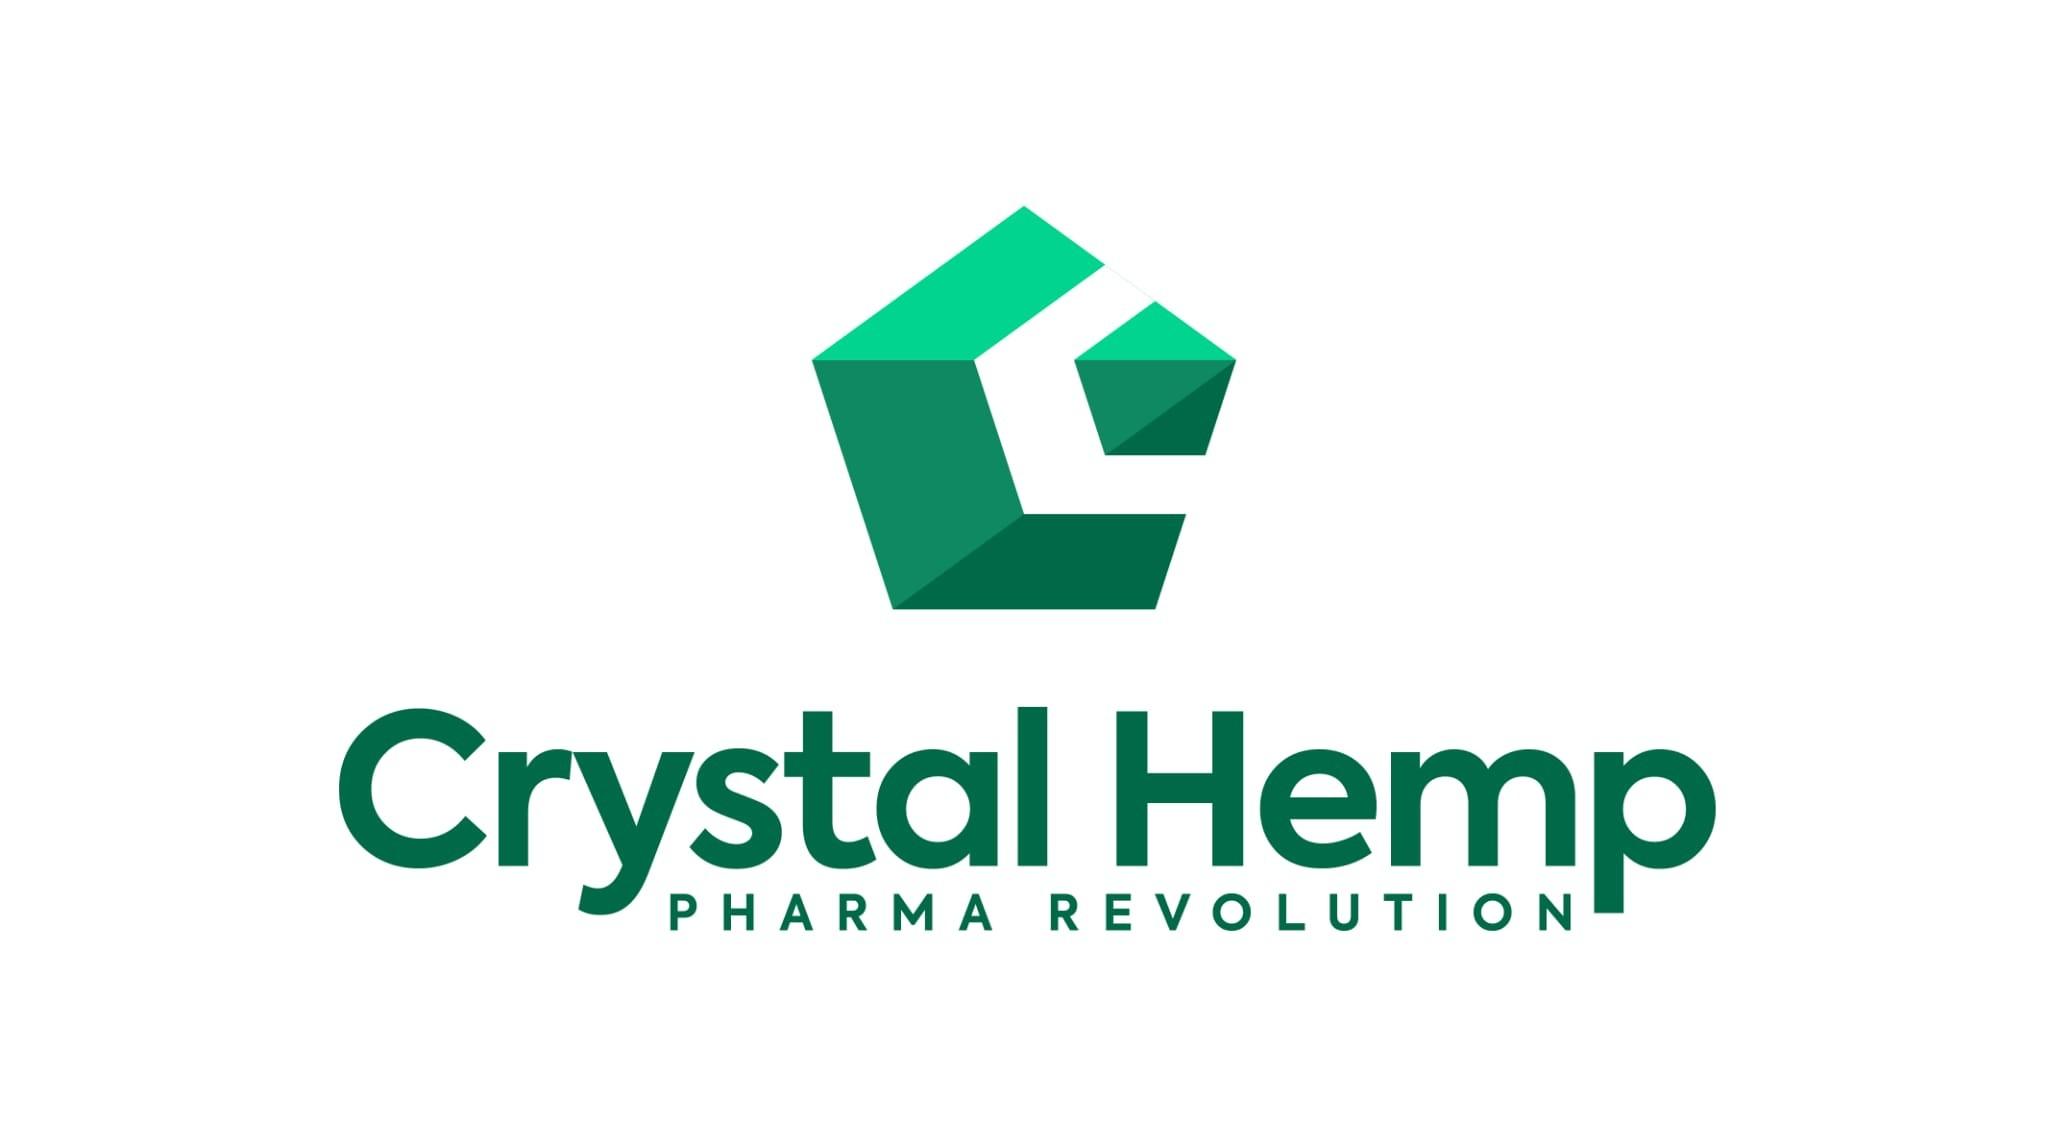 Crystal Hemp SA